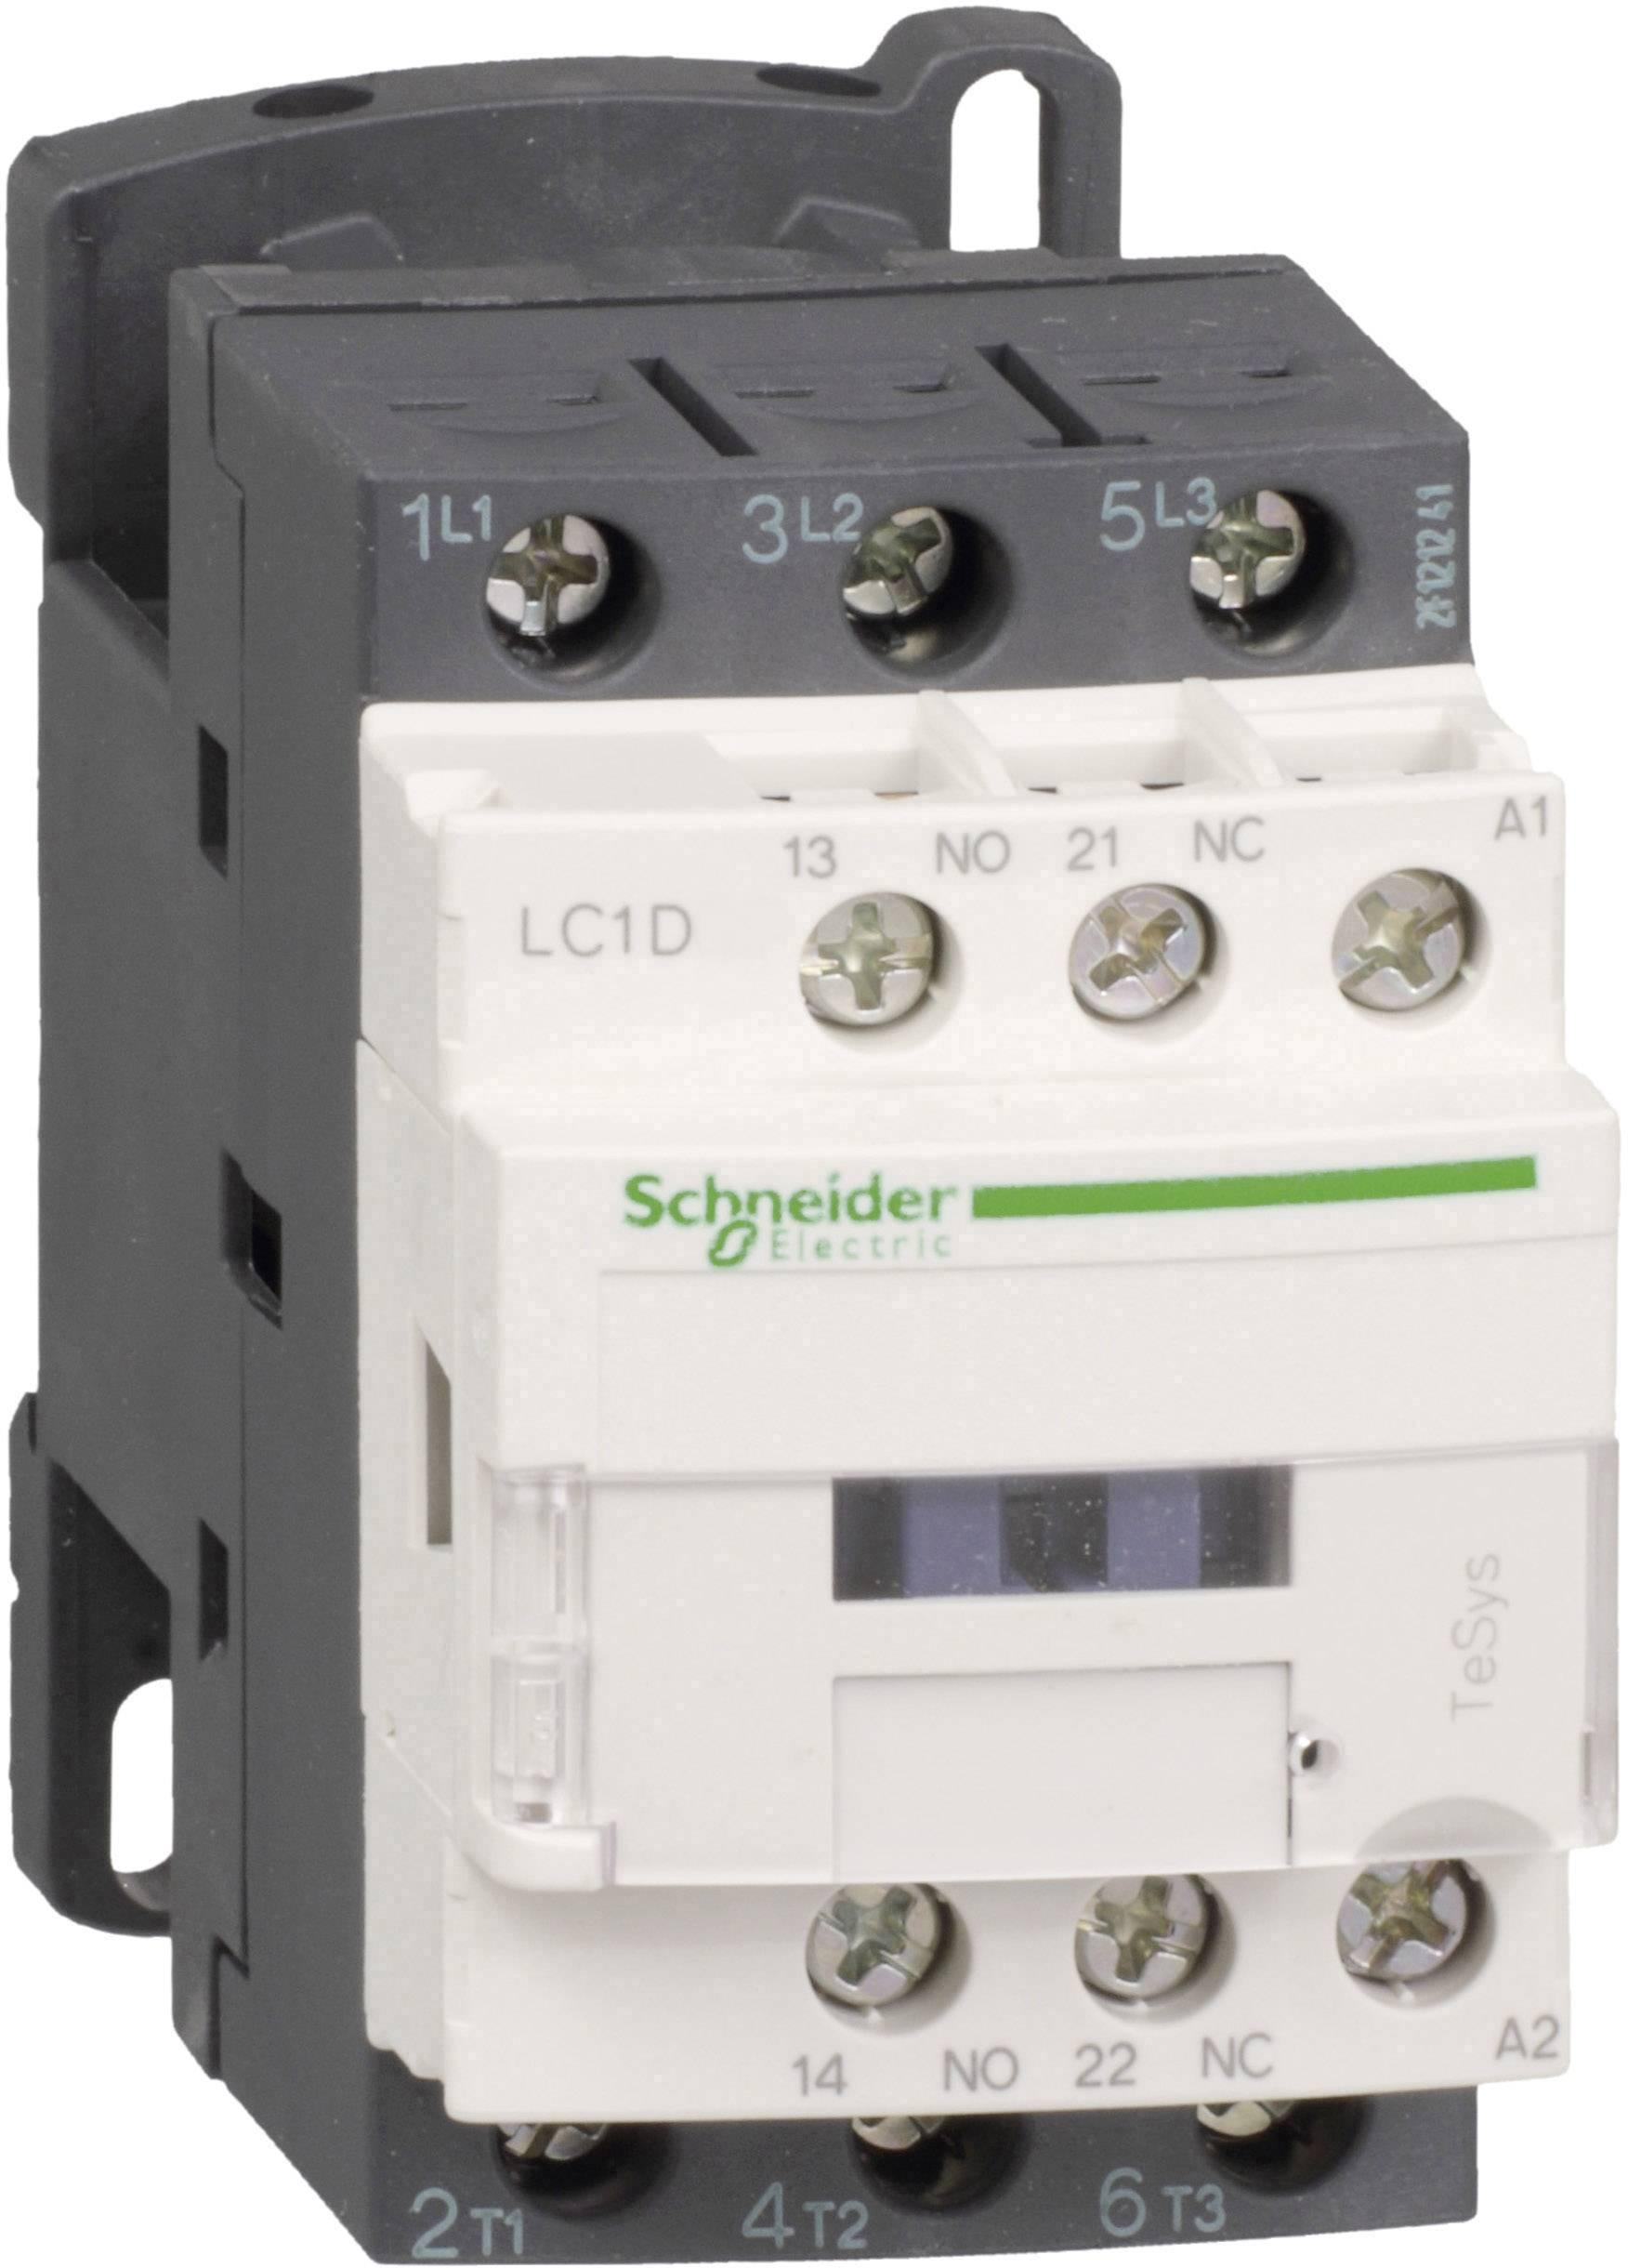 Schneider Electric LC1 D09 BD Contactor 1 pc(s) 1 maker, 1